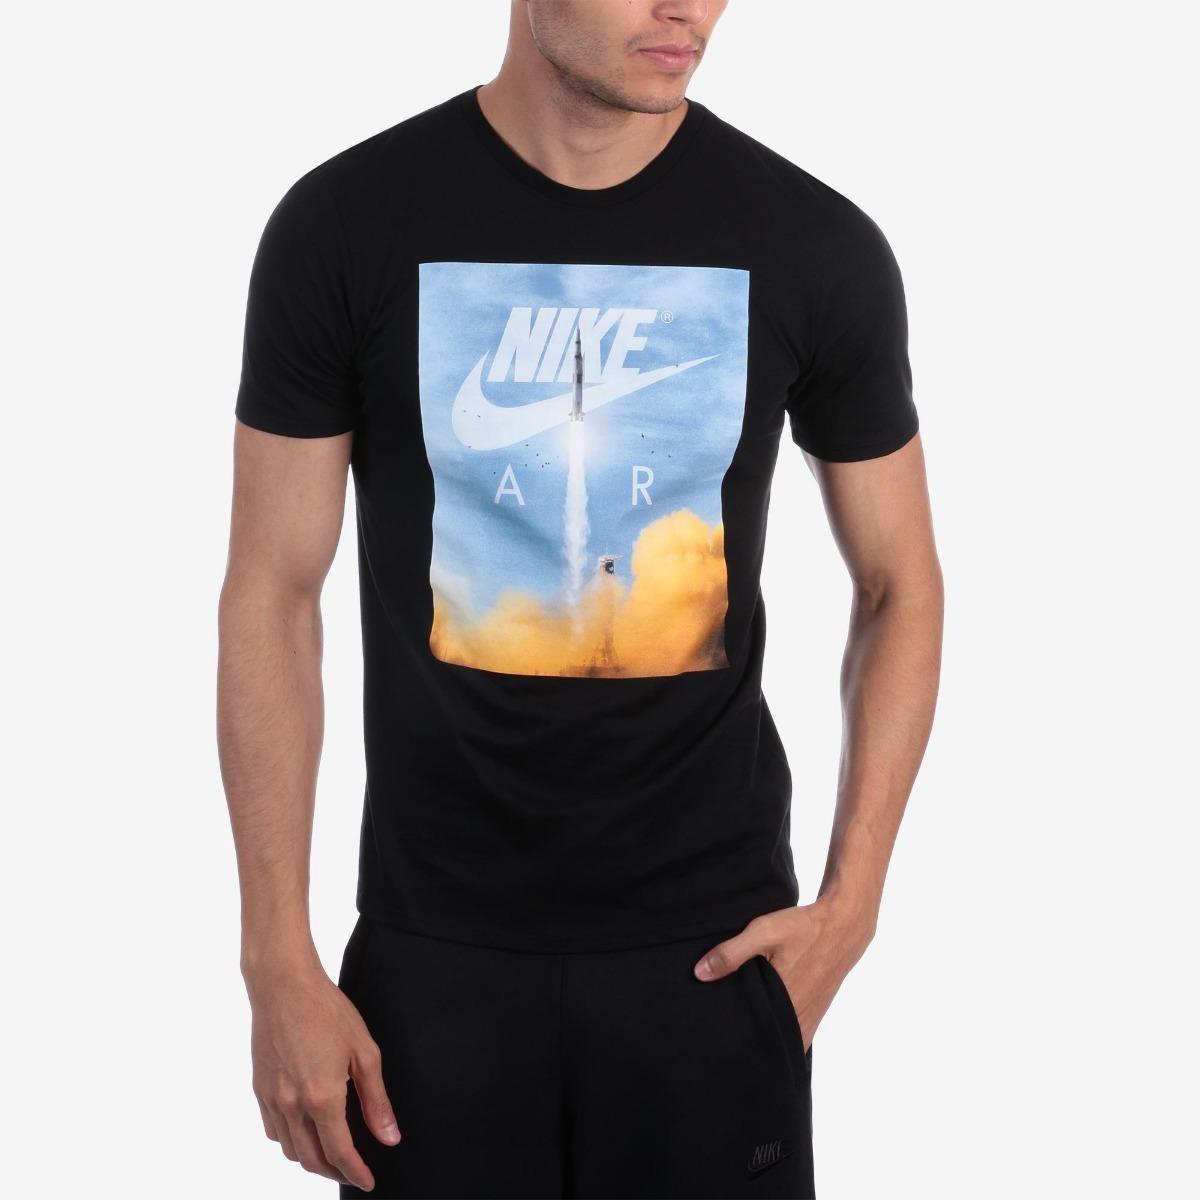 f3ca068c9e camiseta nike sportswear air set in masculina pronta entrega. Carregando  zoom.